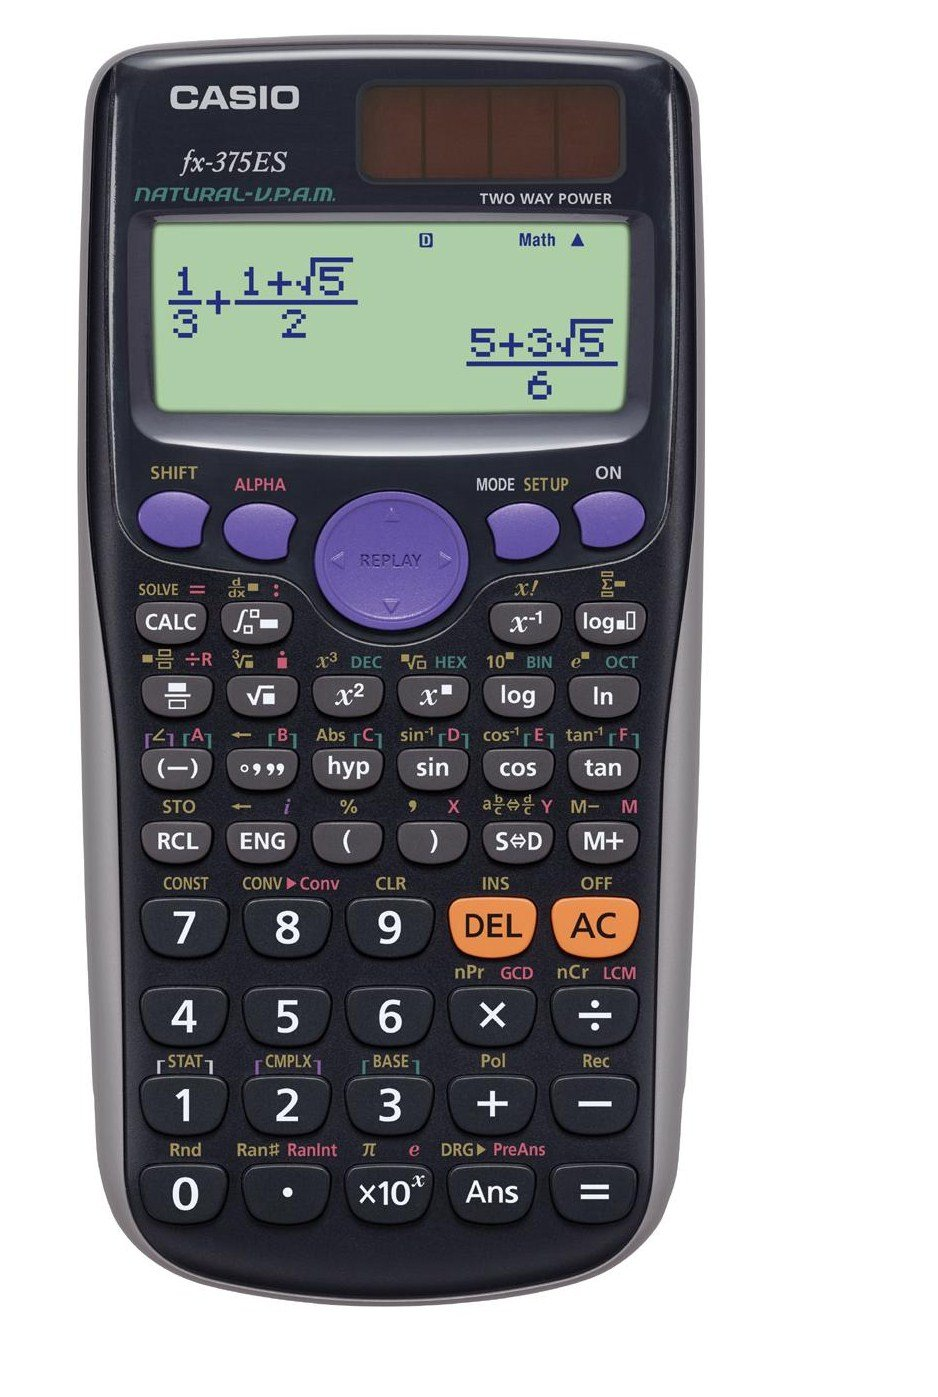 CASIO カシオ 関数電卓 394関数・機能数 数学自然表示 fx-375ES-N ブラック